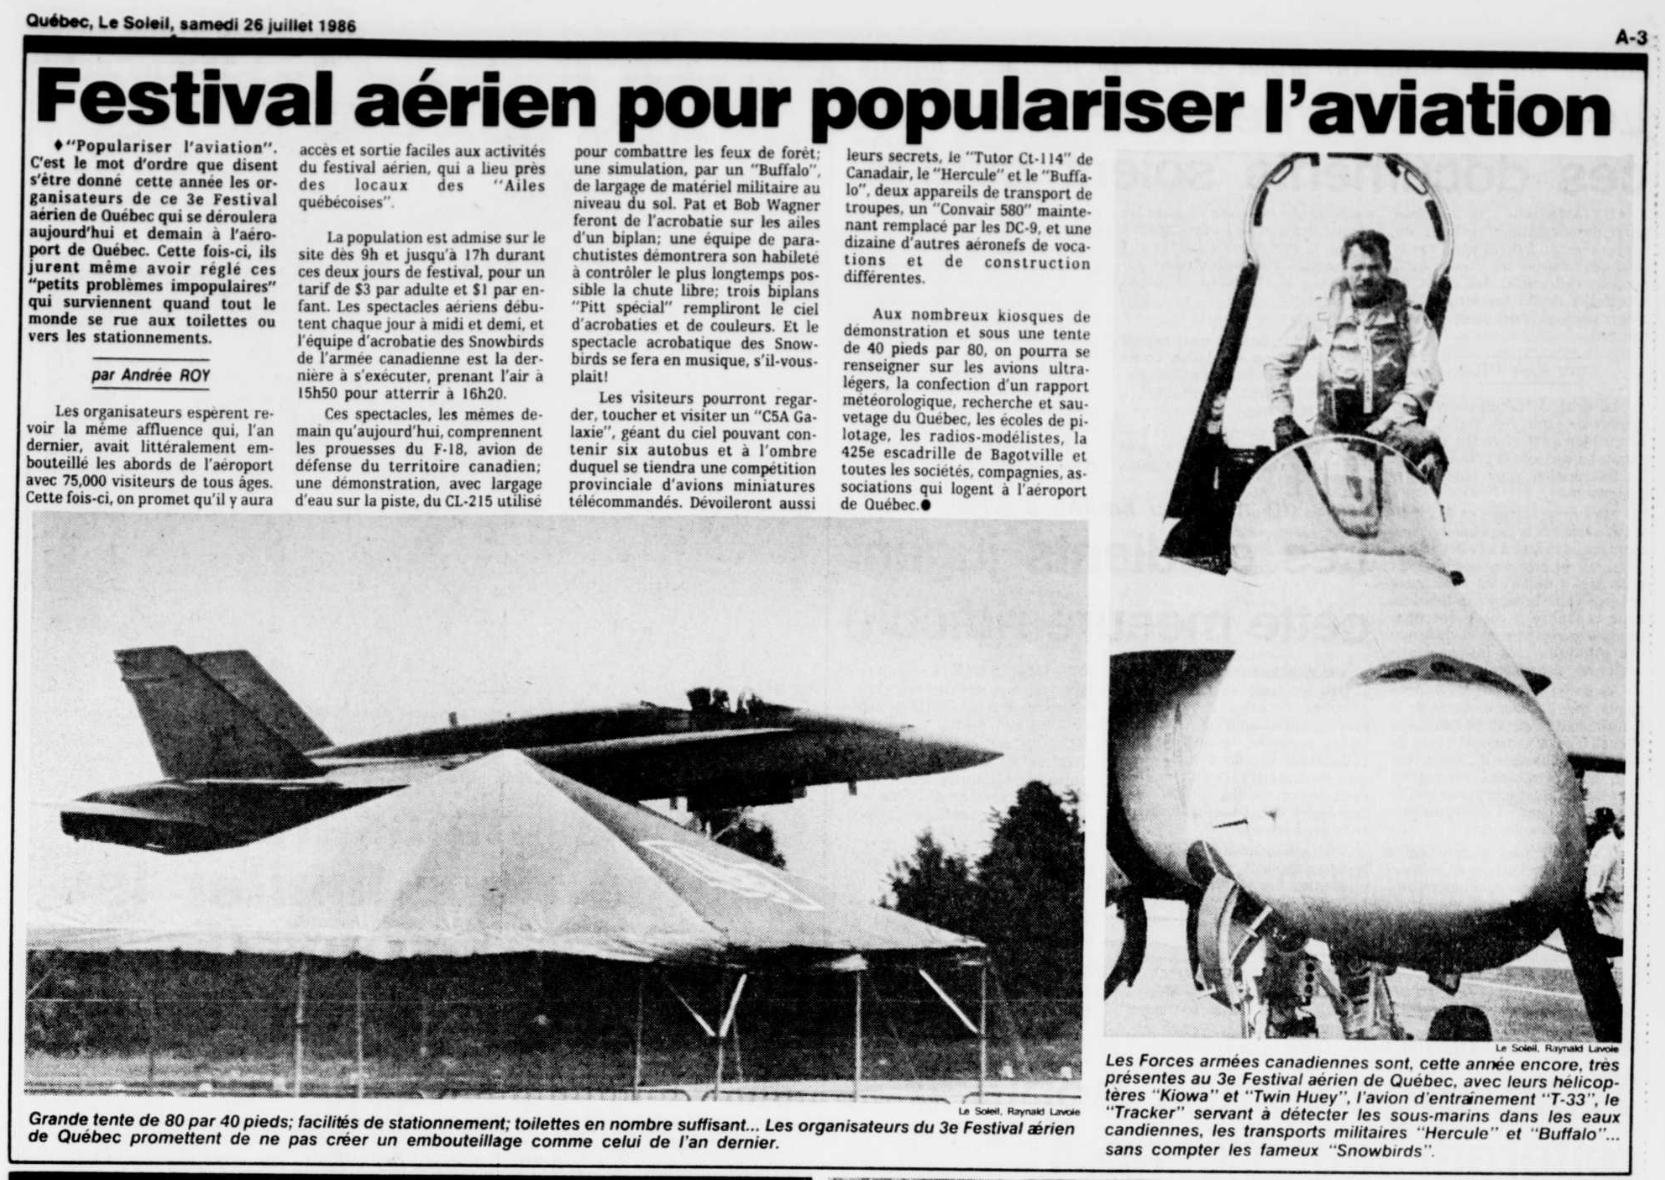 Journal Le Soleil 26 juillet 1986